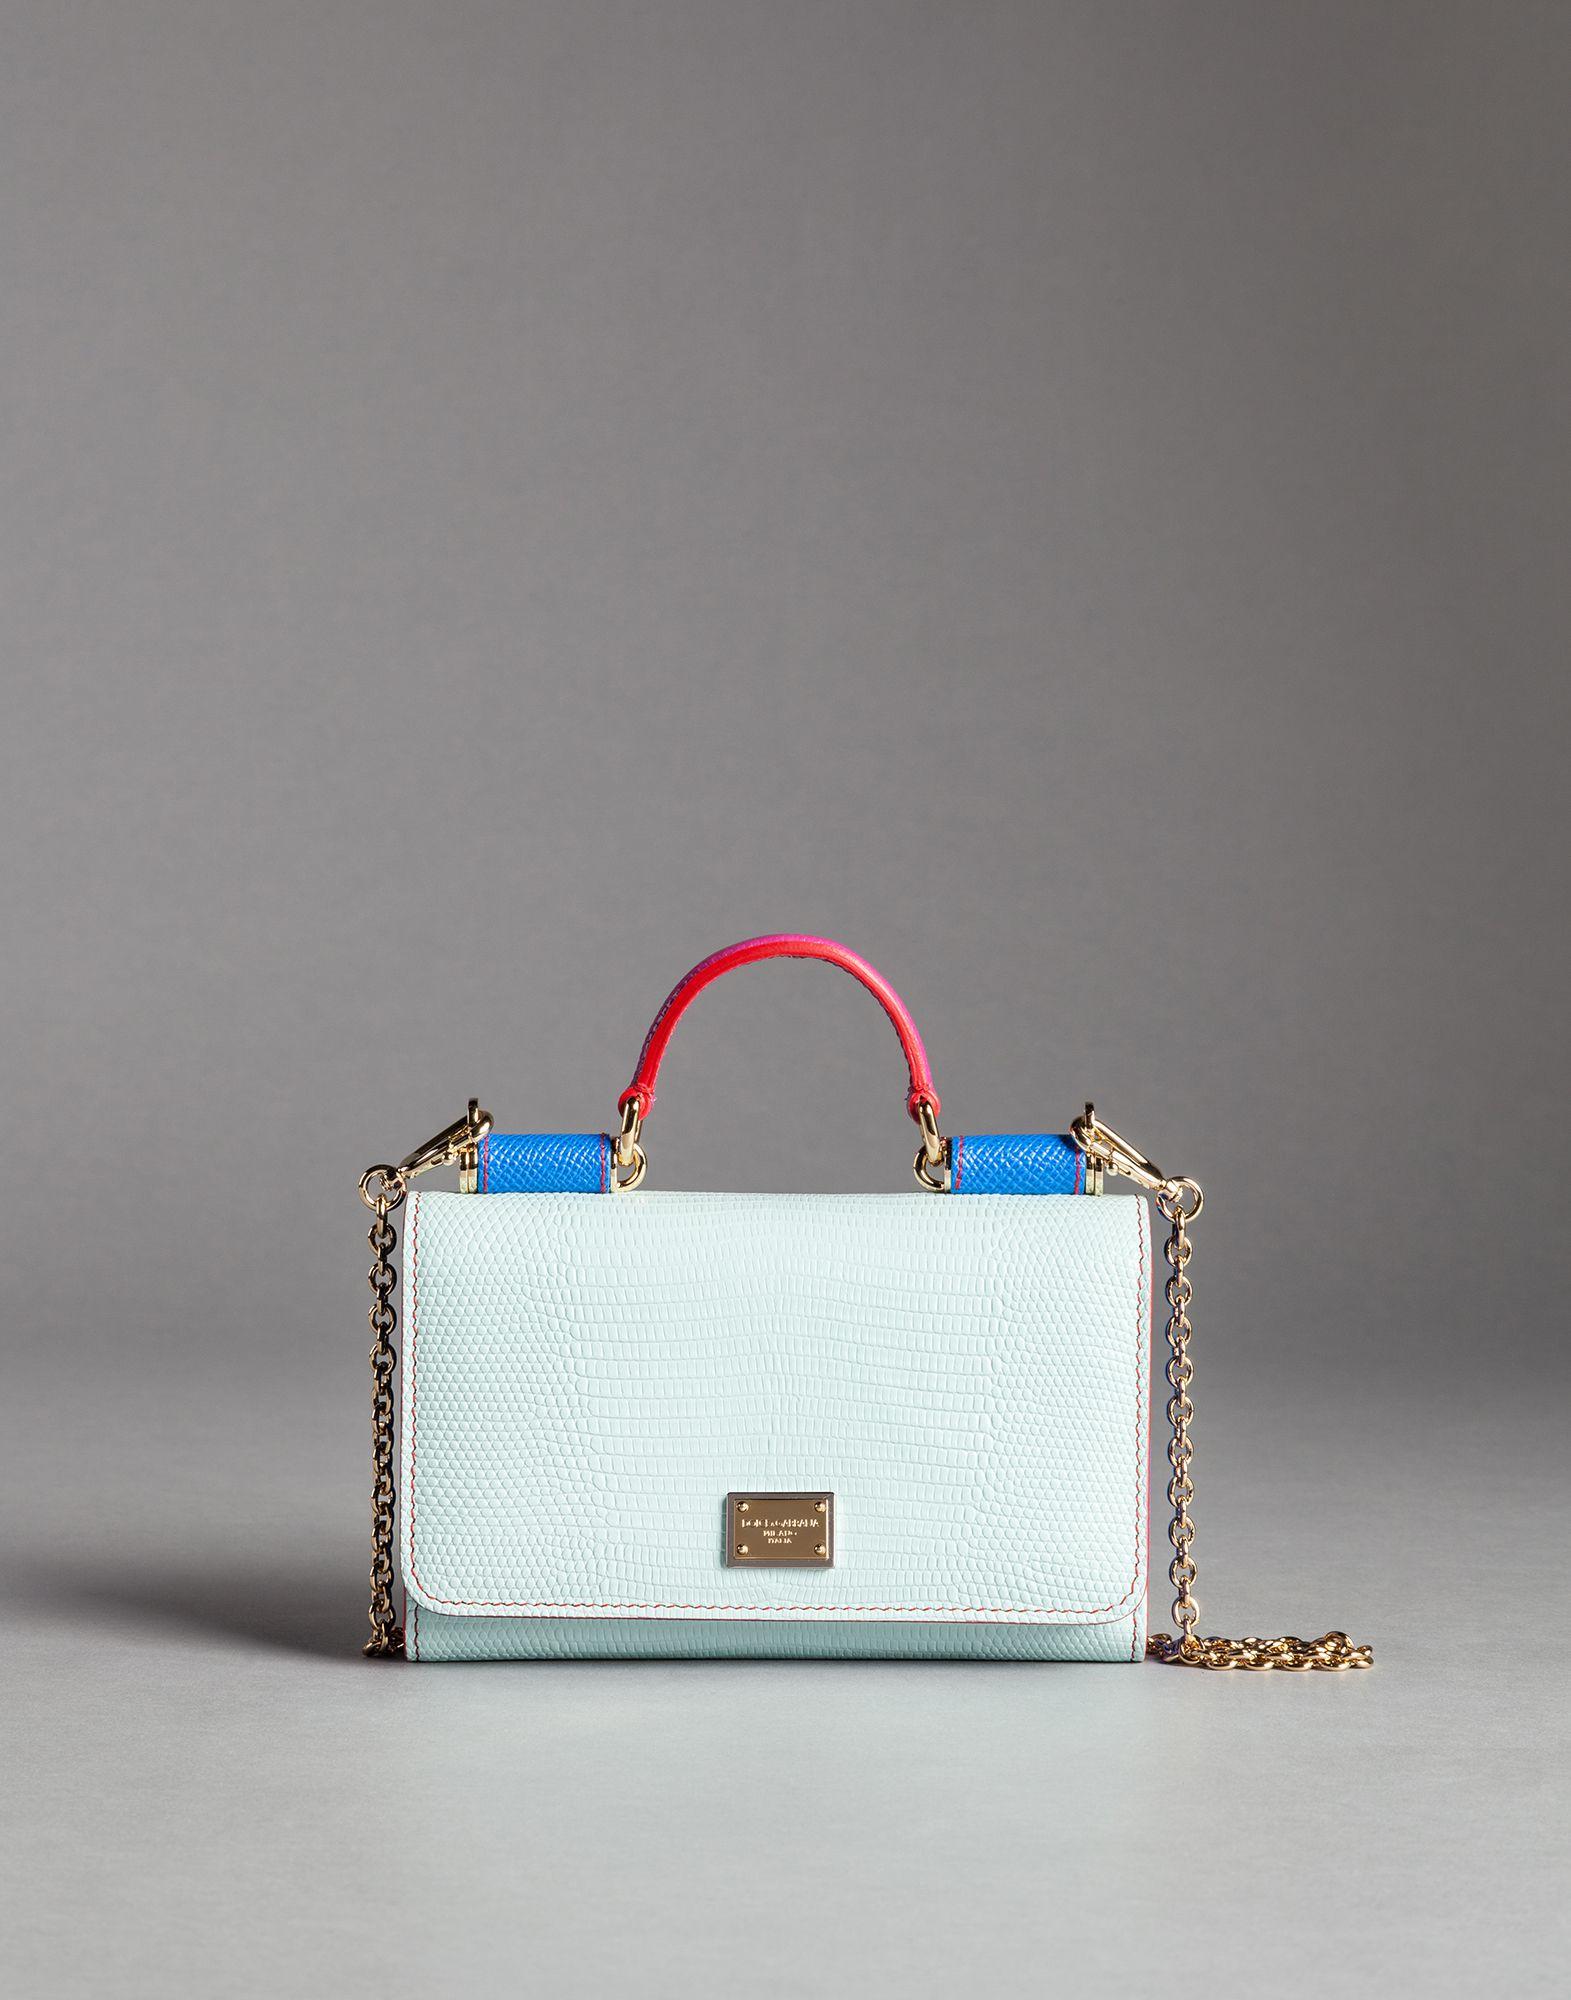 53862e1280 Dolce   Gabbana Mini Von Bag Mix Limited Edition in Green - Lyst